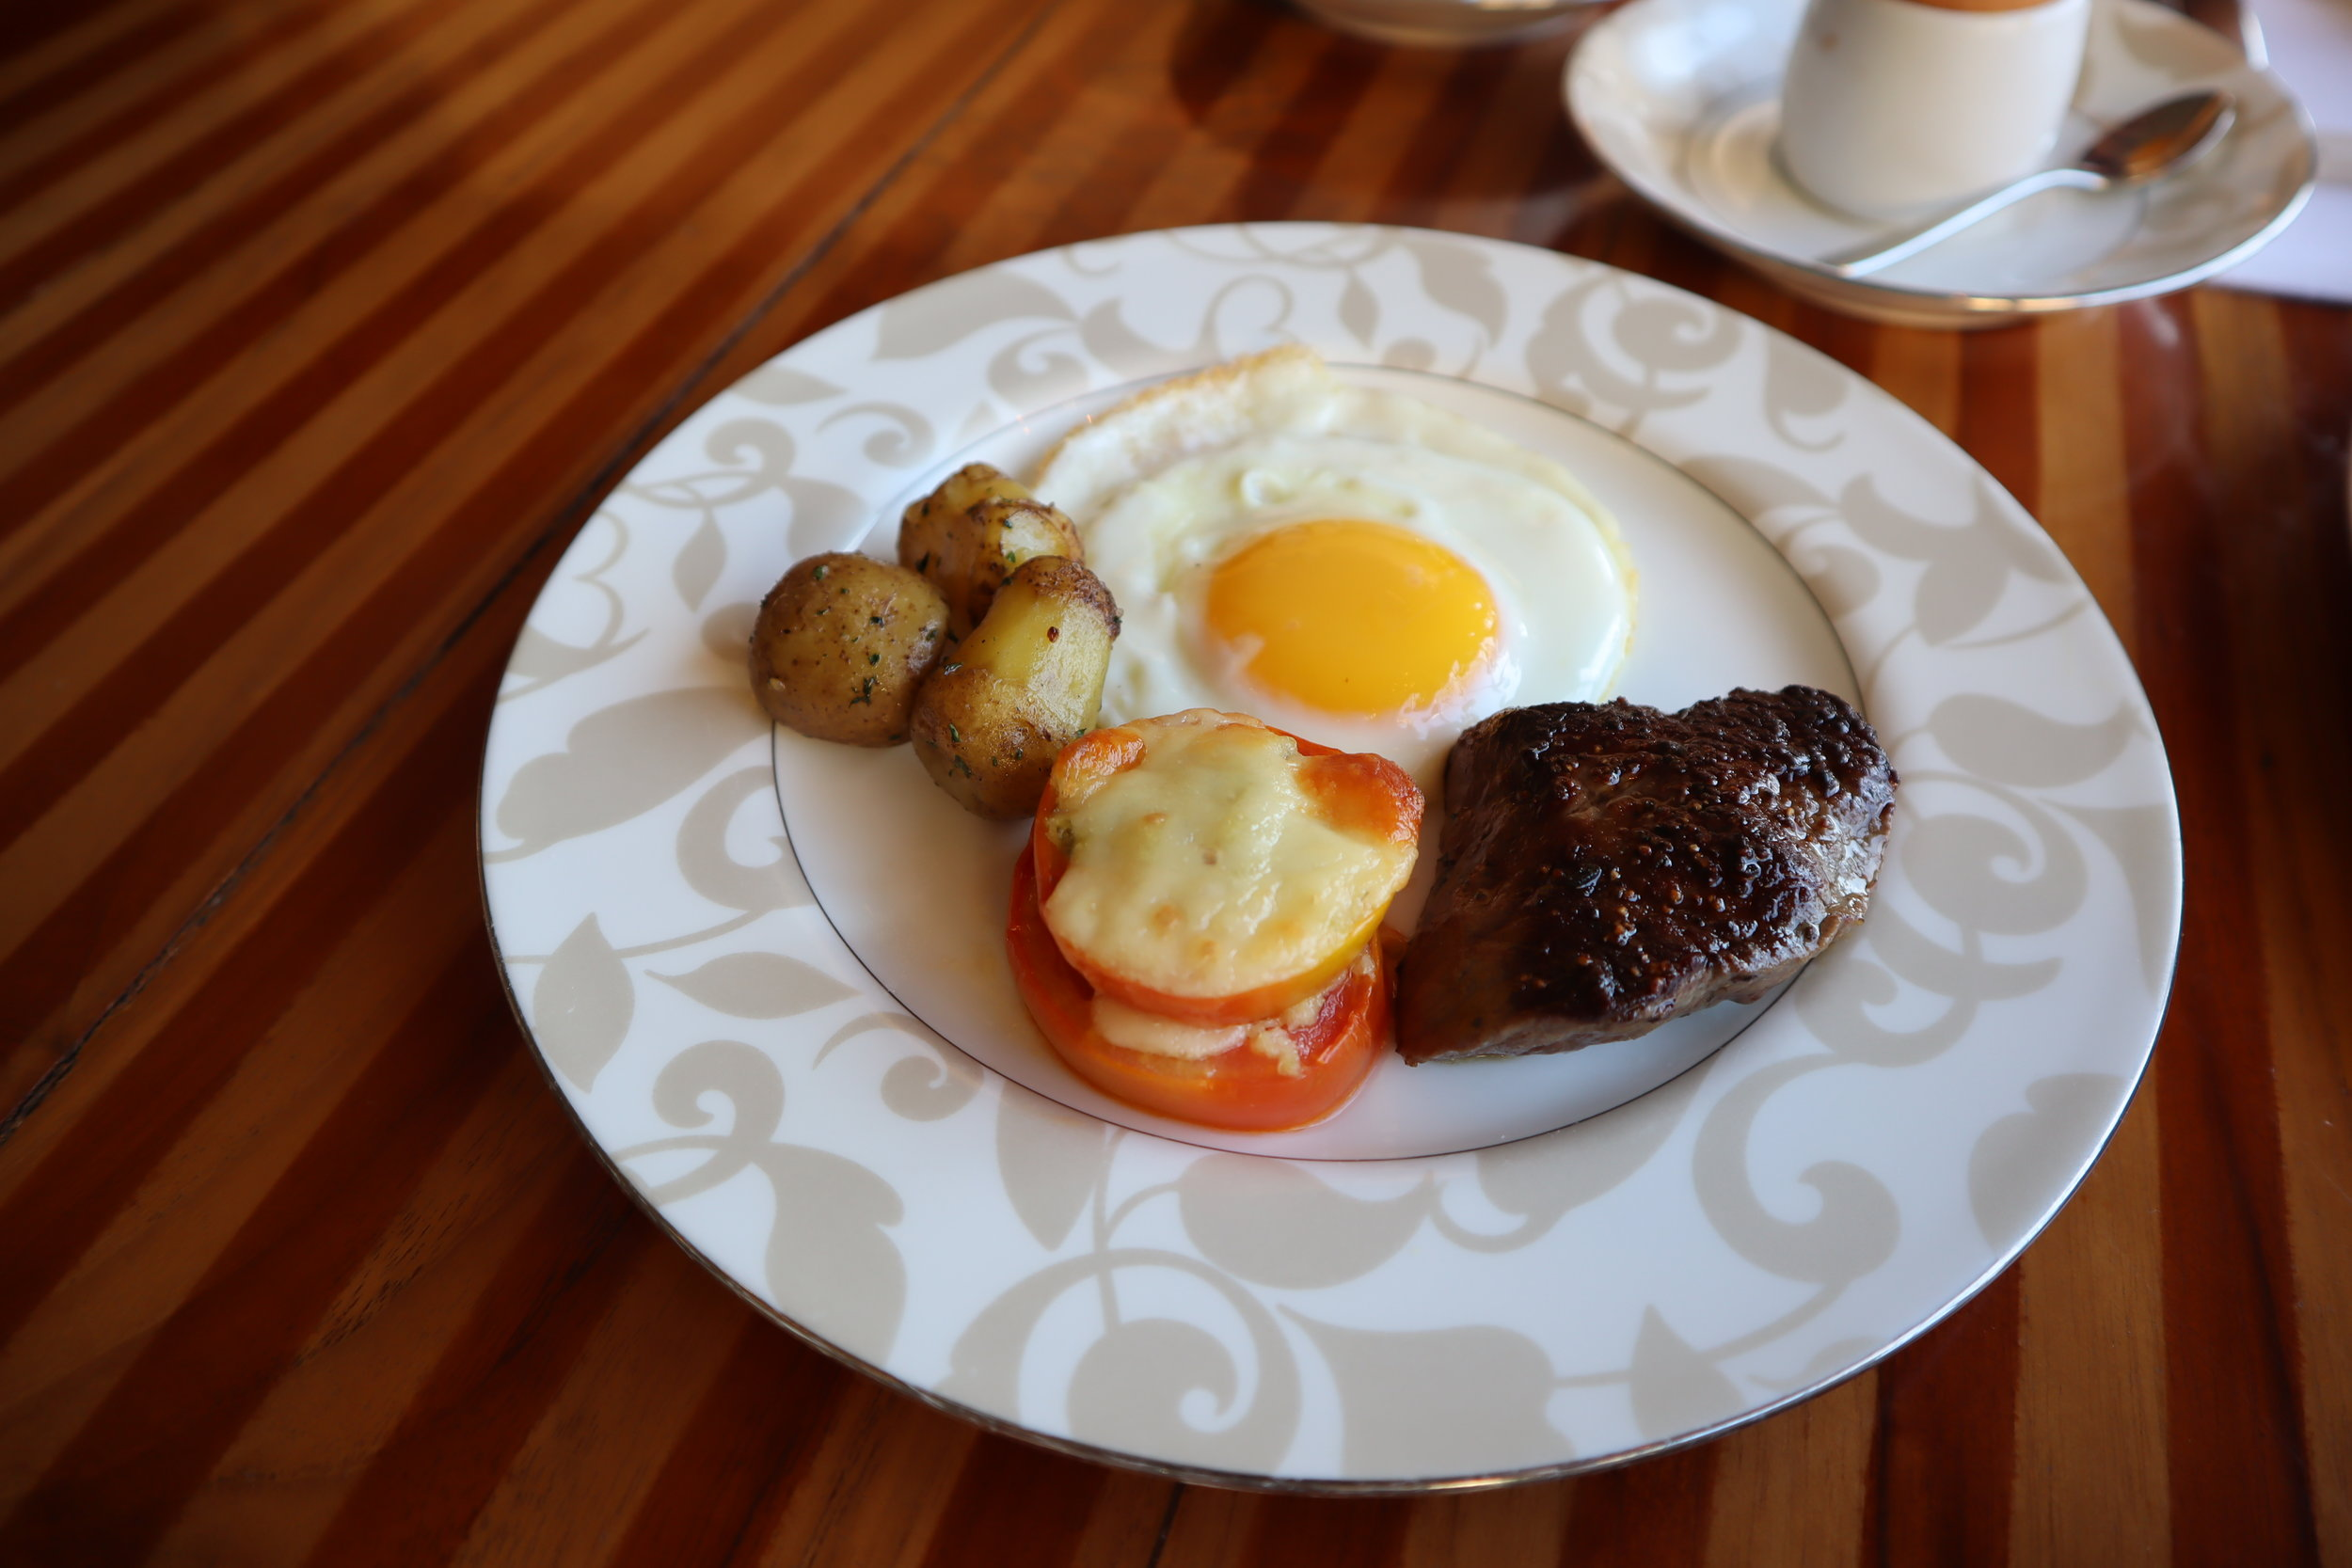 St. Regis Bali – Steak and eggs